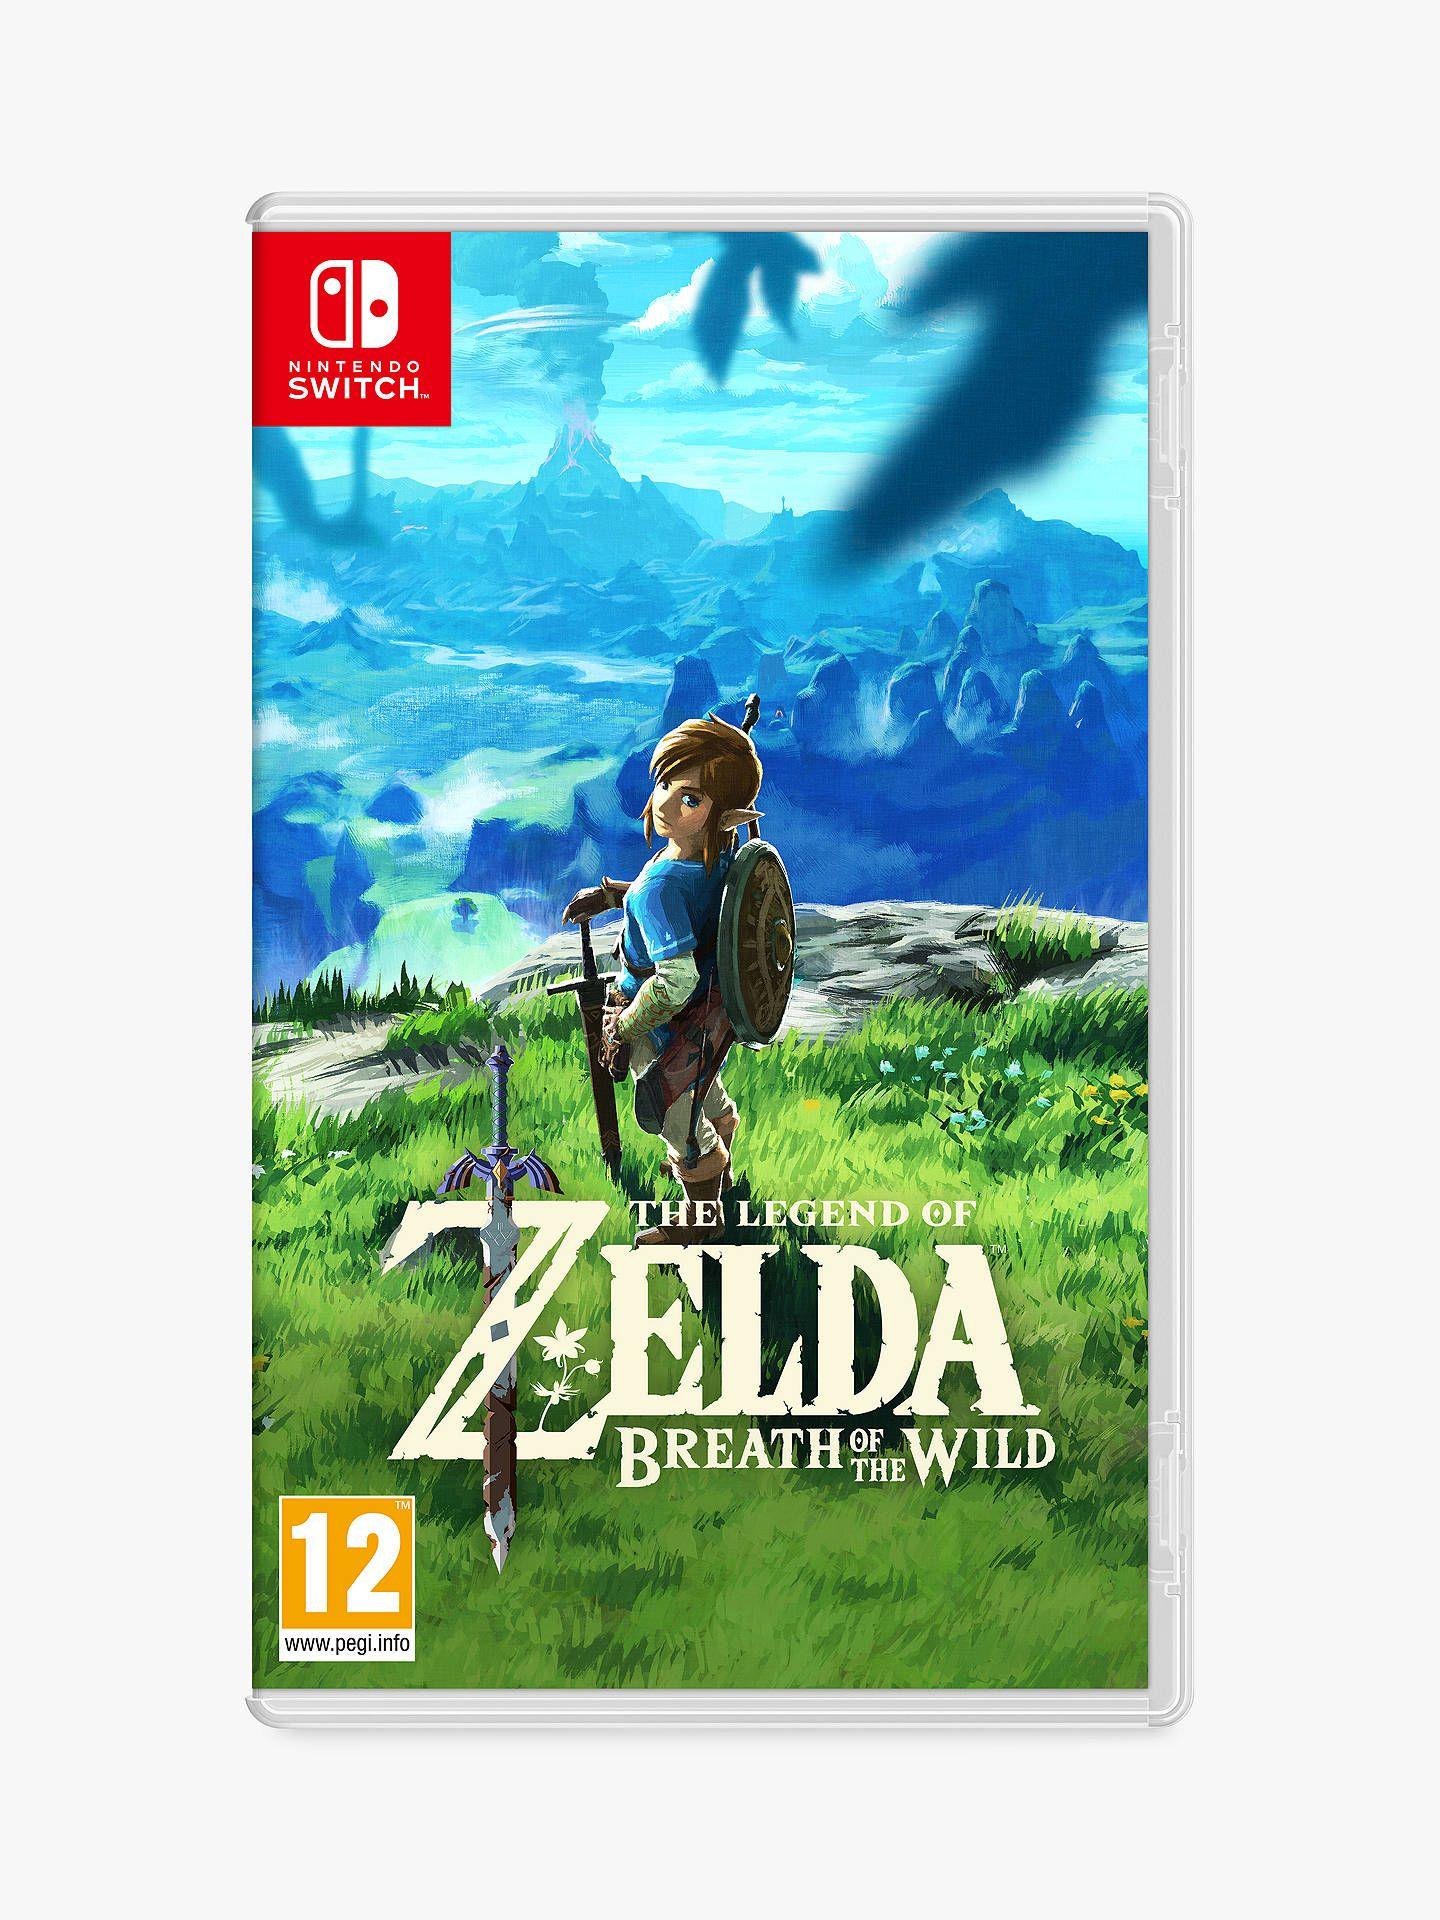 The Legend of Zelda: Breath of the Wild (Nintendo Switch) £44 @ Amazon